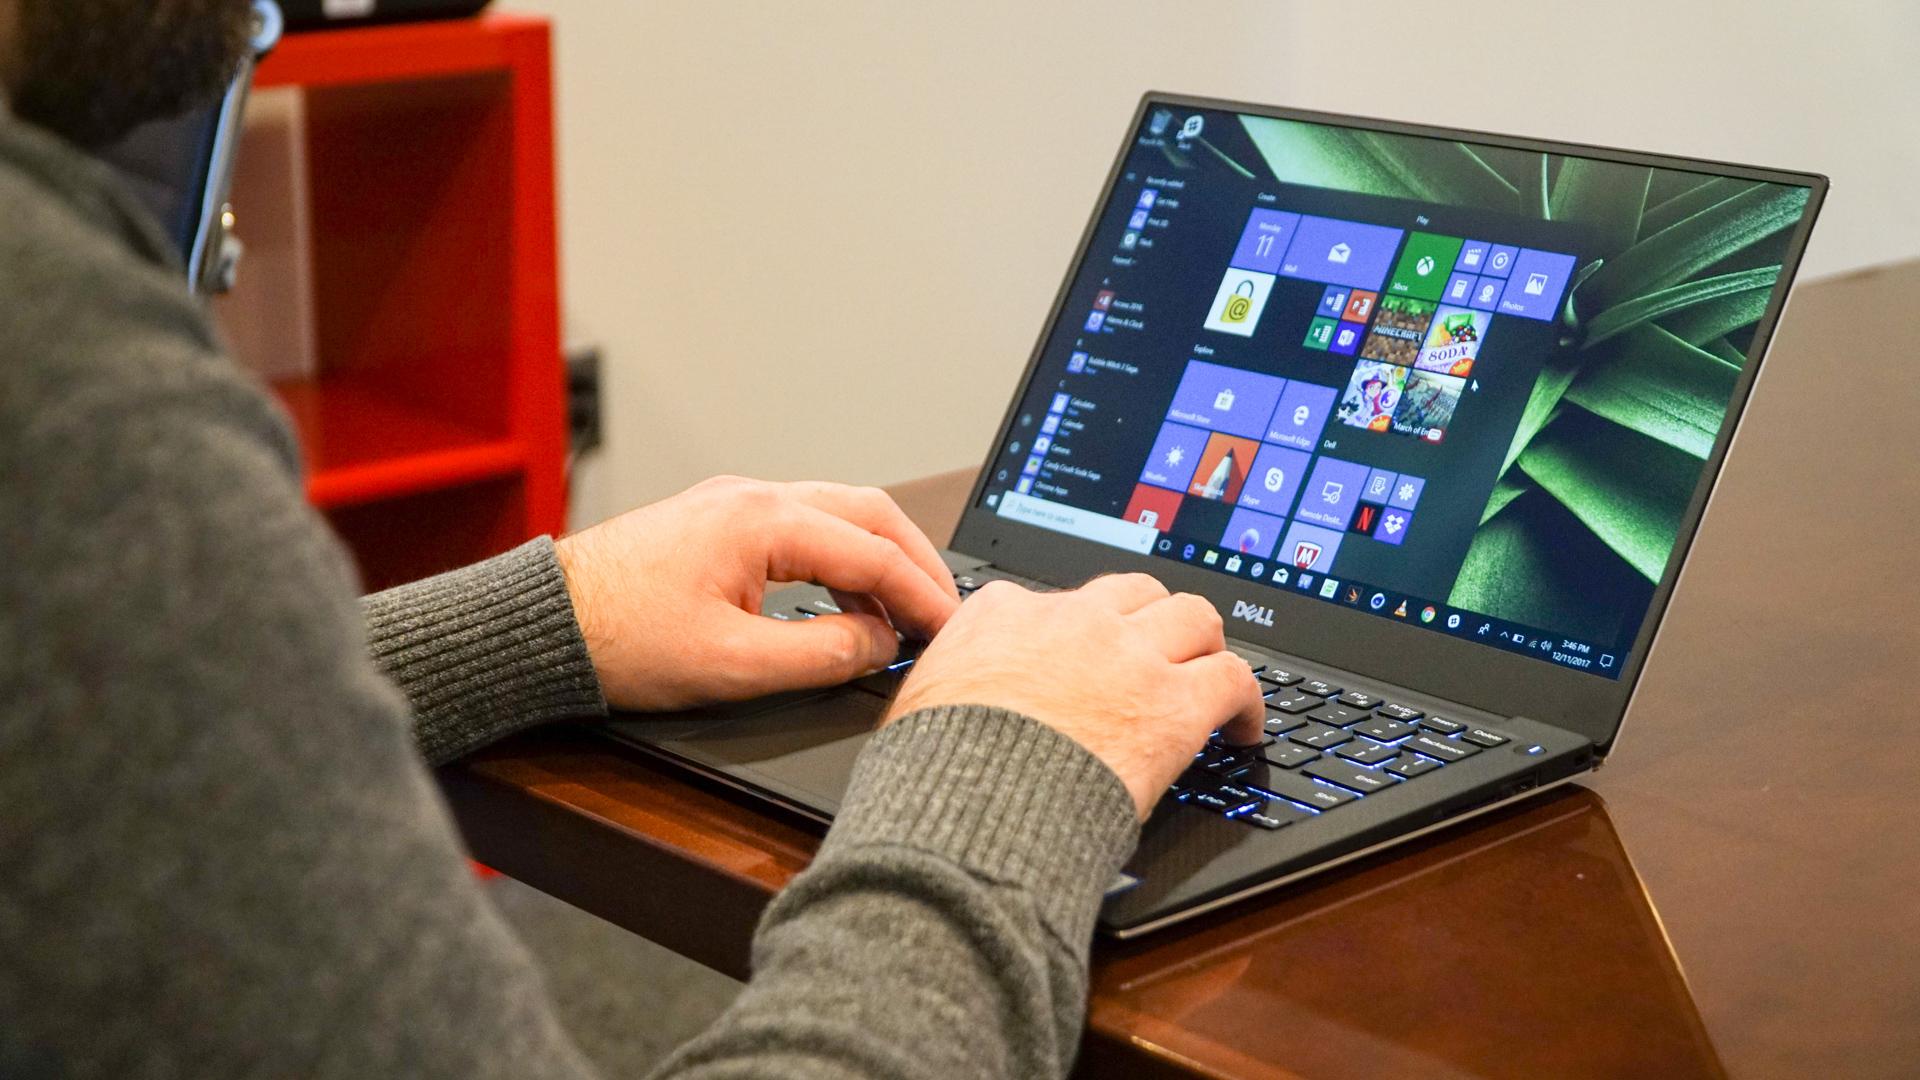 How to Fix Windows 10 Not Responding